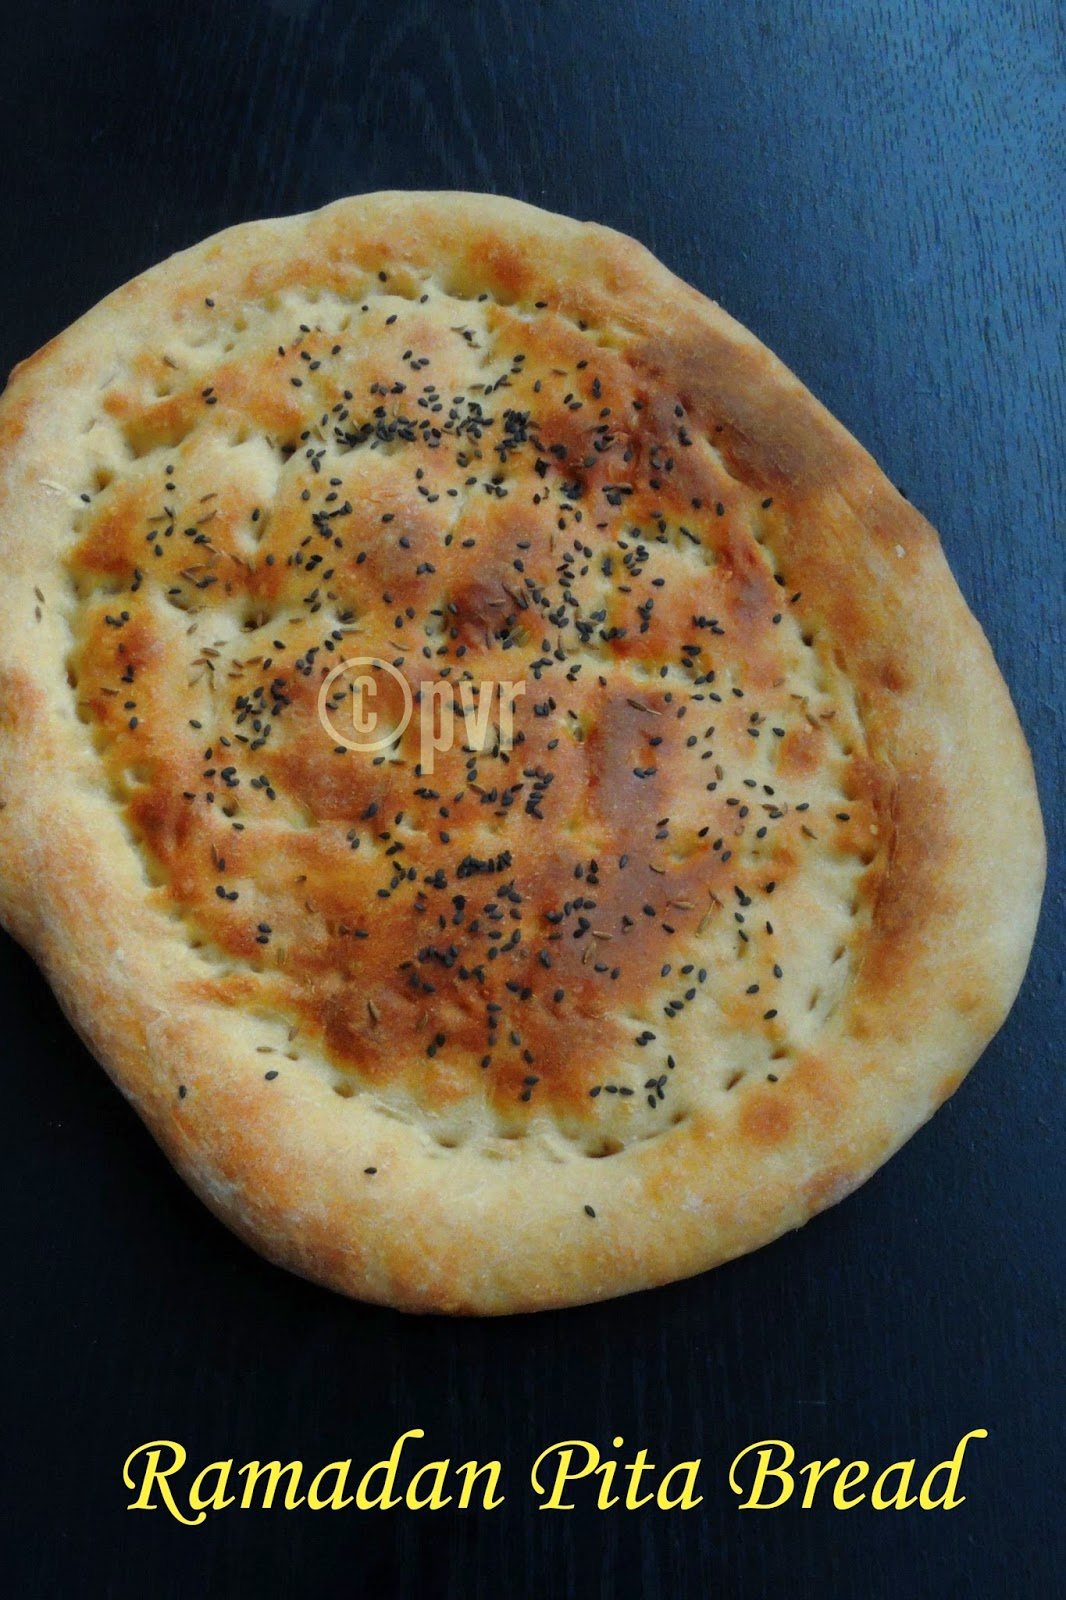 Ramadan Turkish Pita Bread